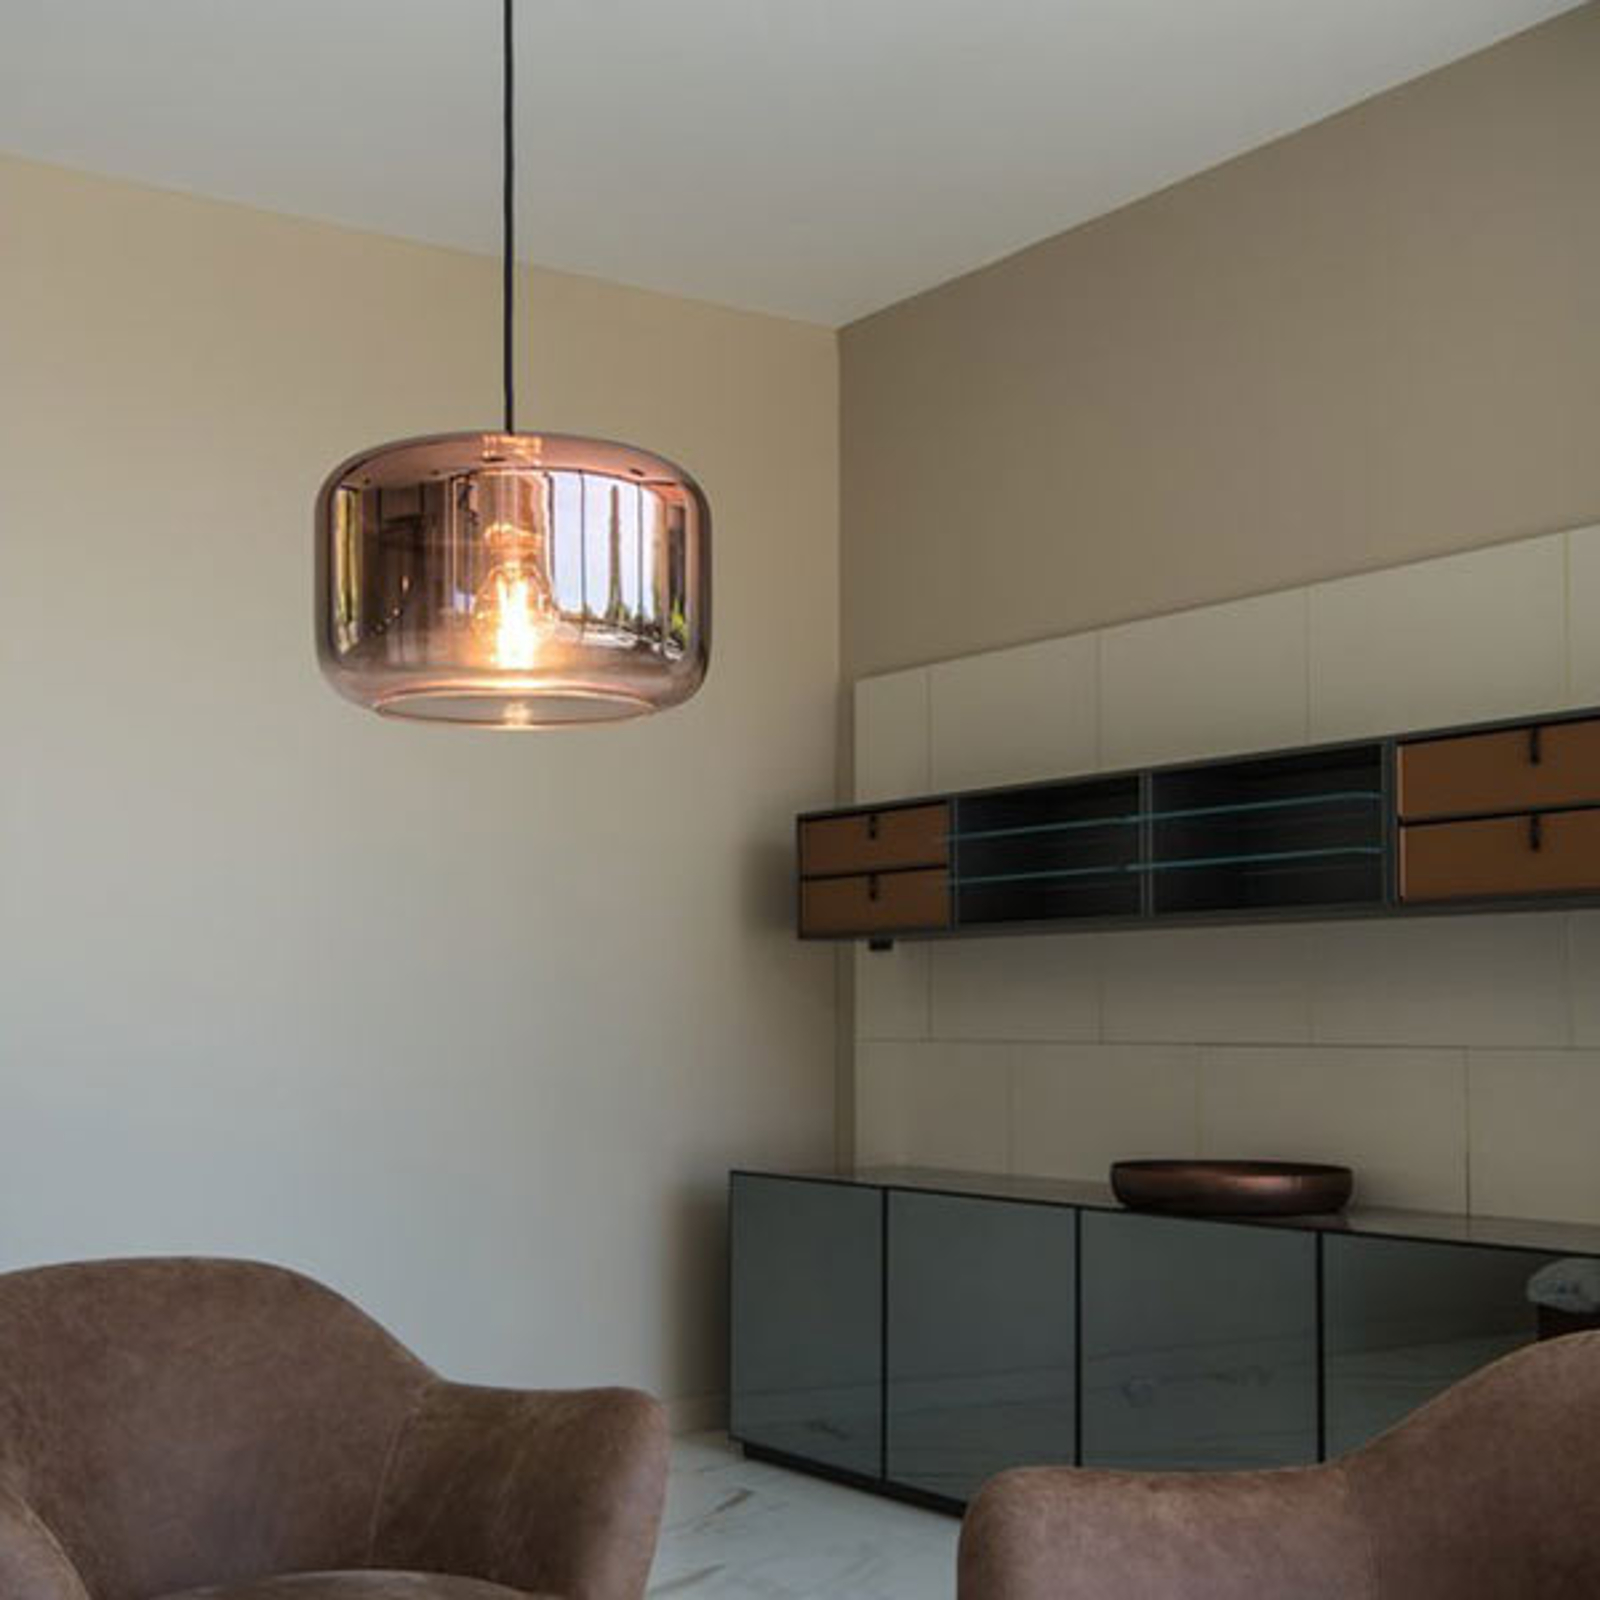 SLV Pantilo 28 hanglamp, Ø 28 cm, koper